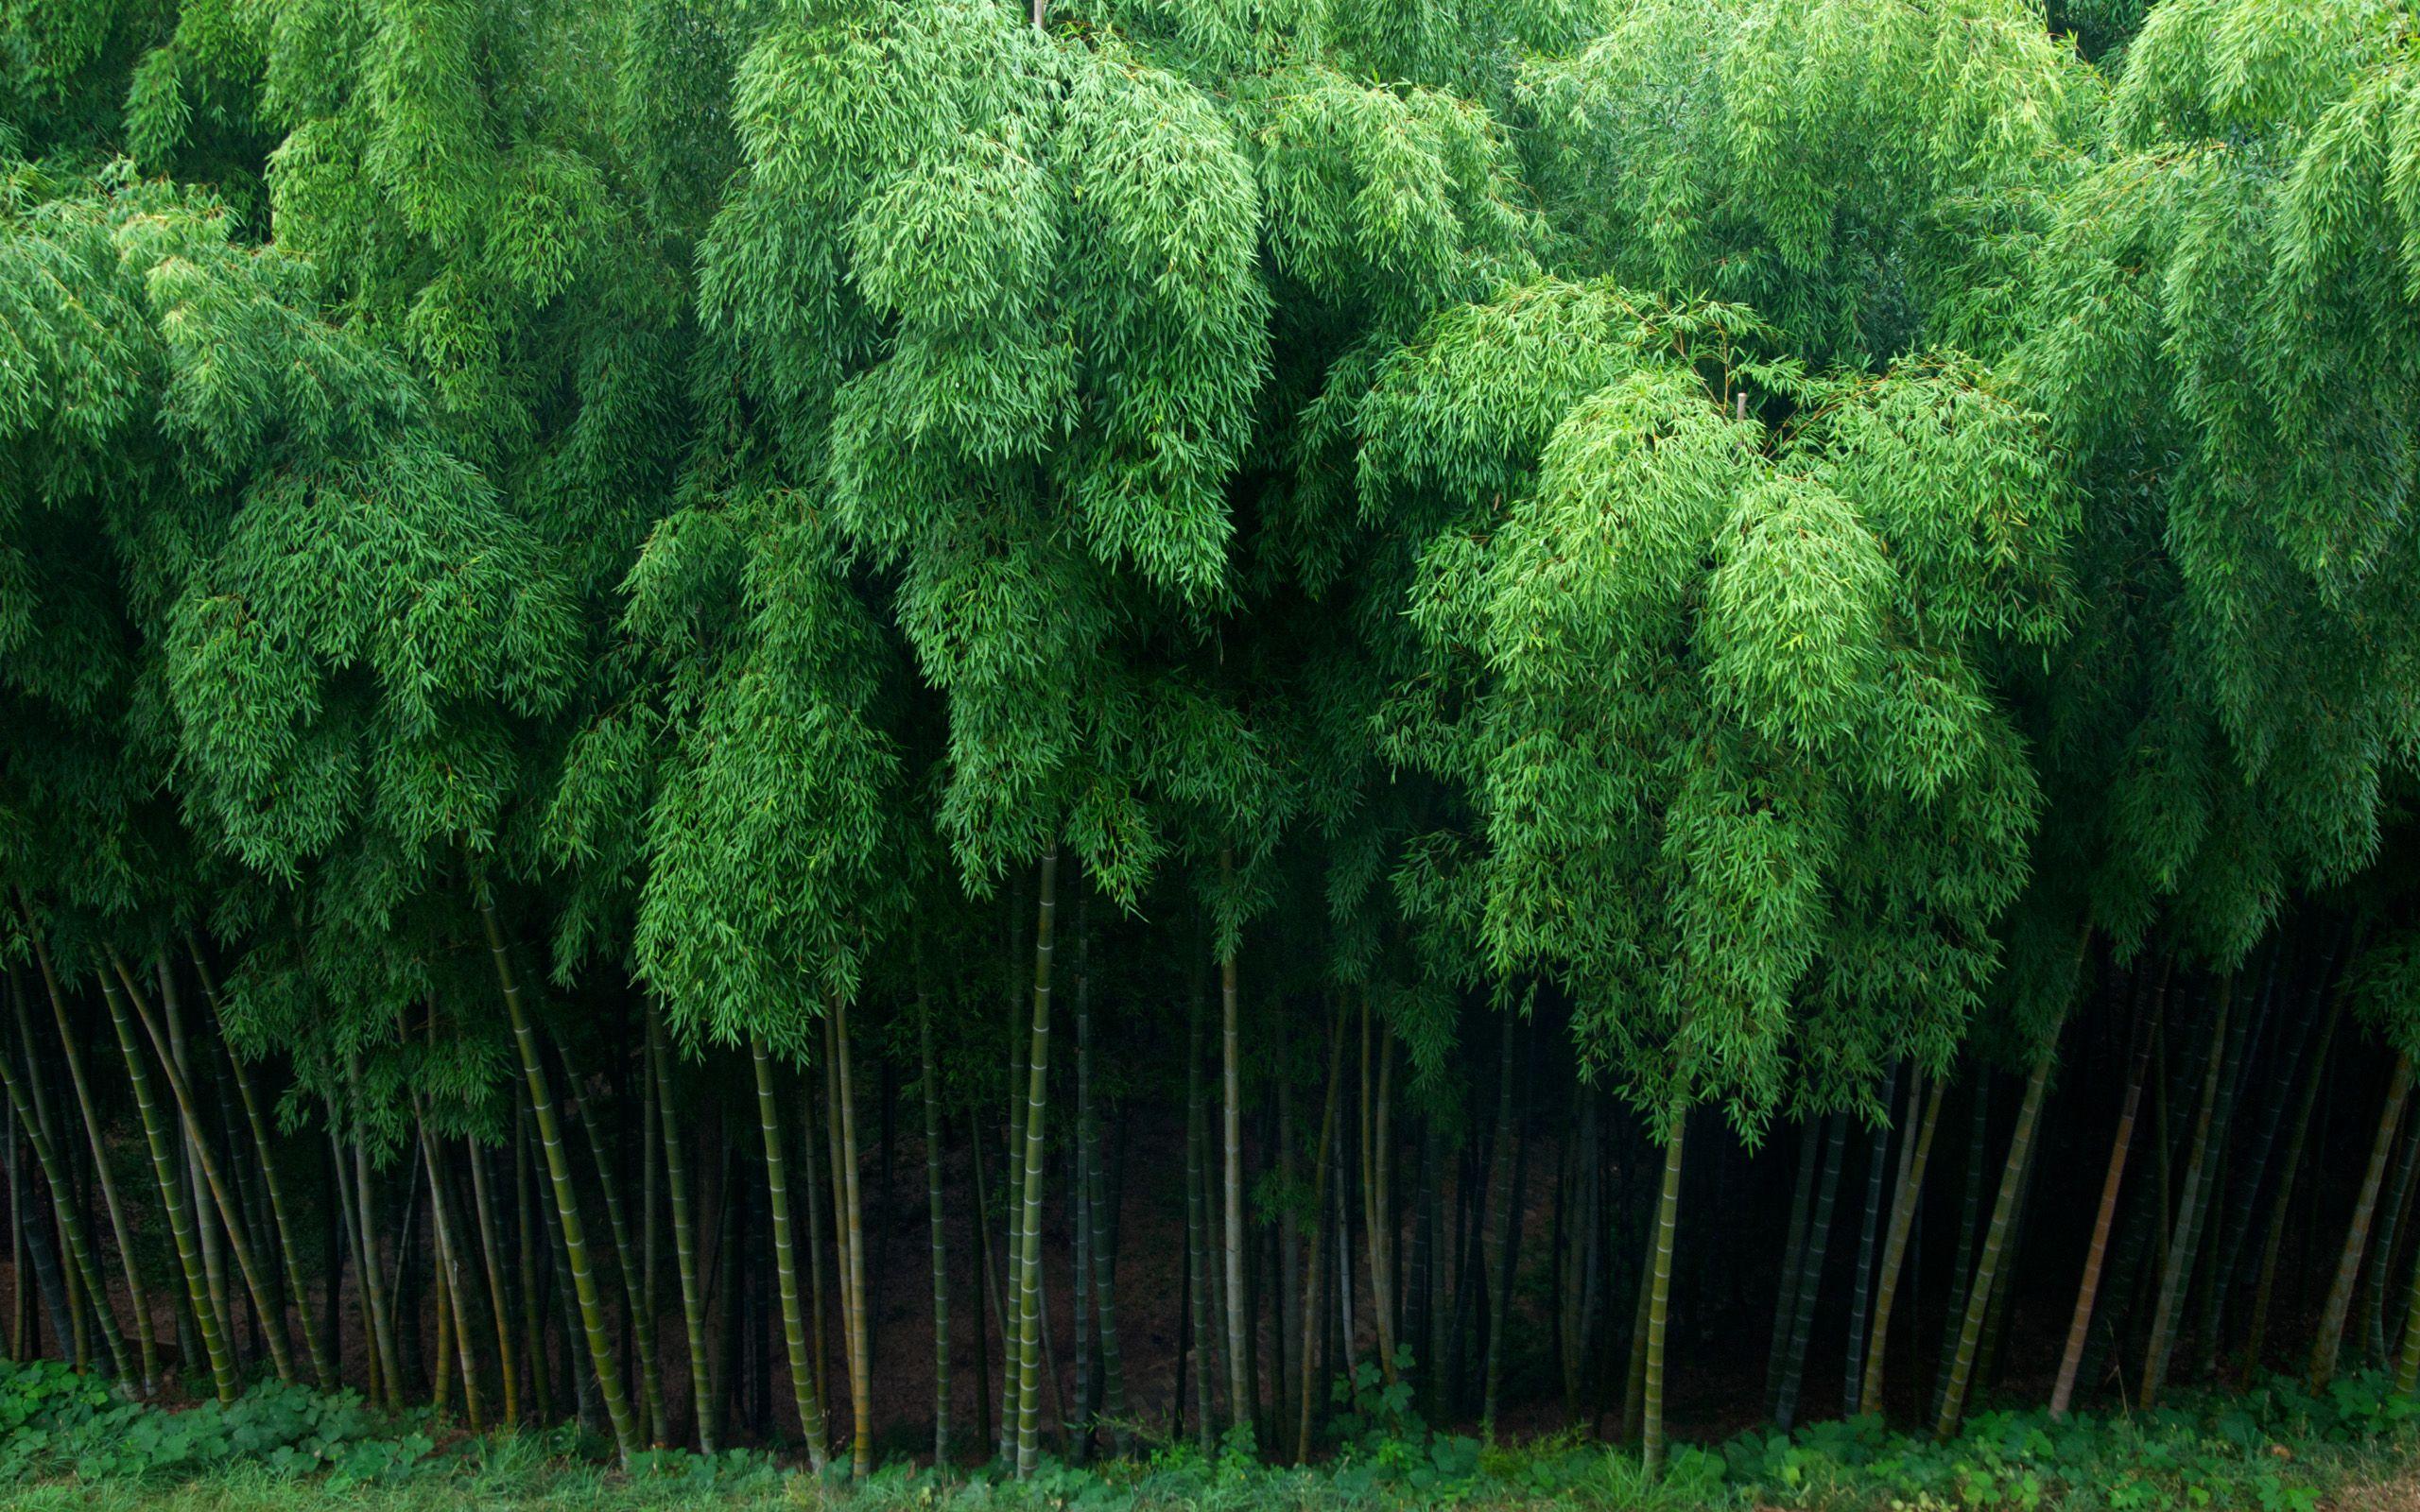 bamboo background images